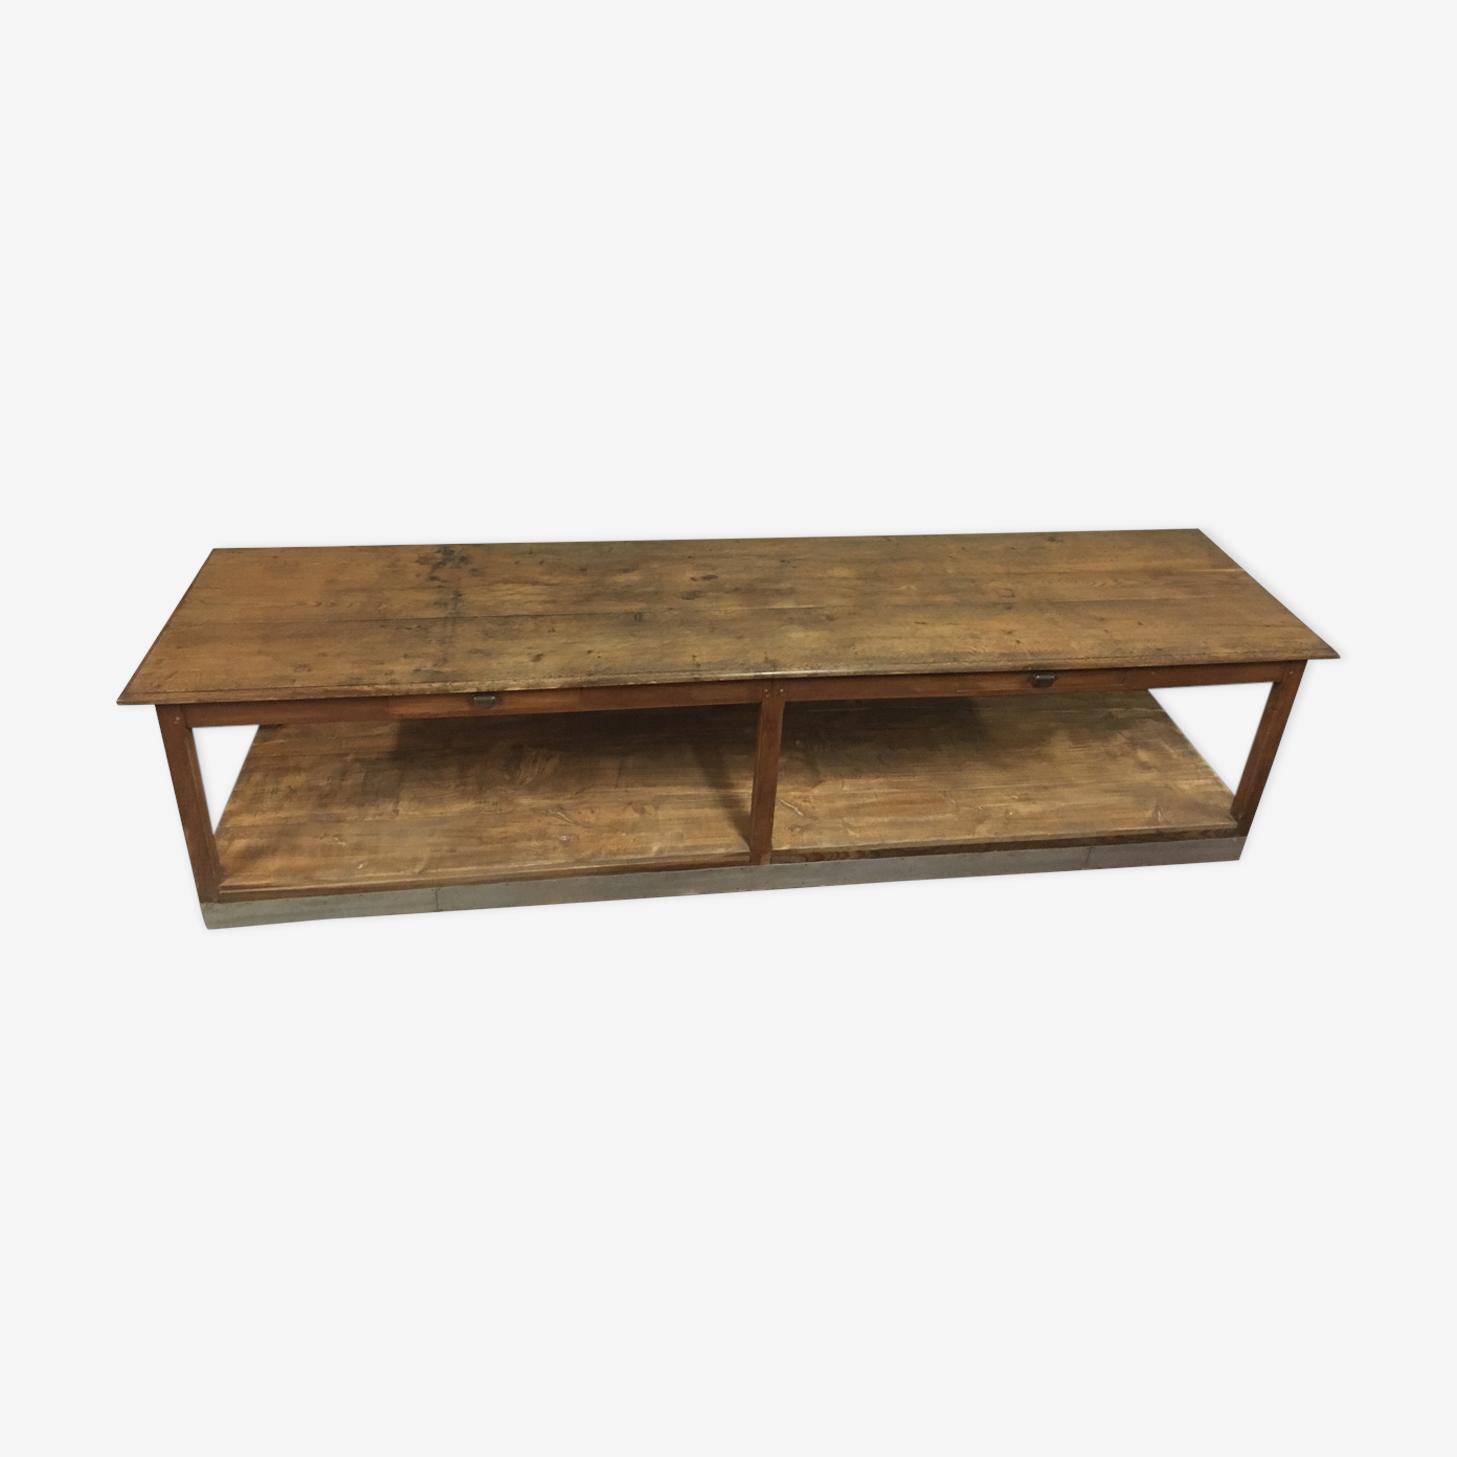 Old Draper table